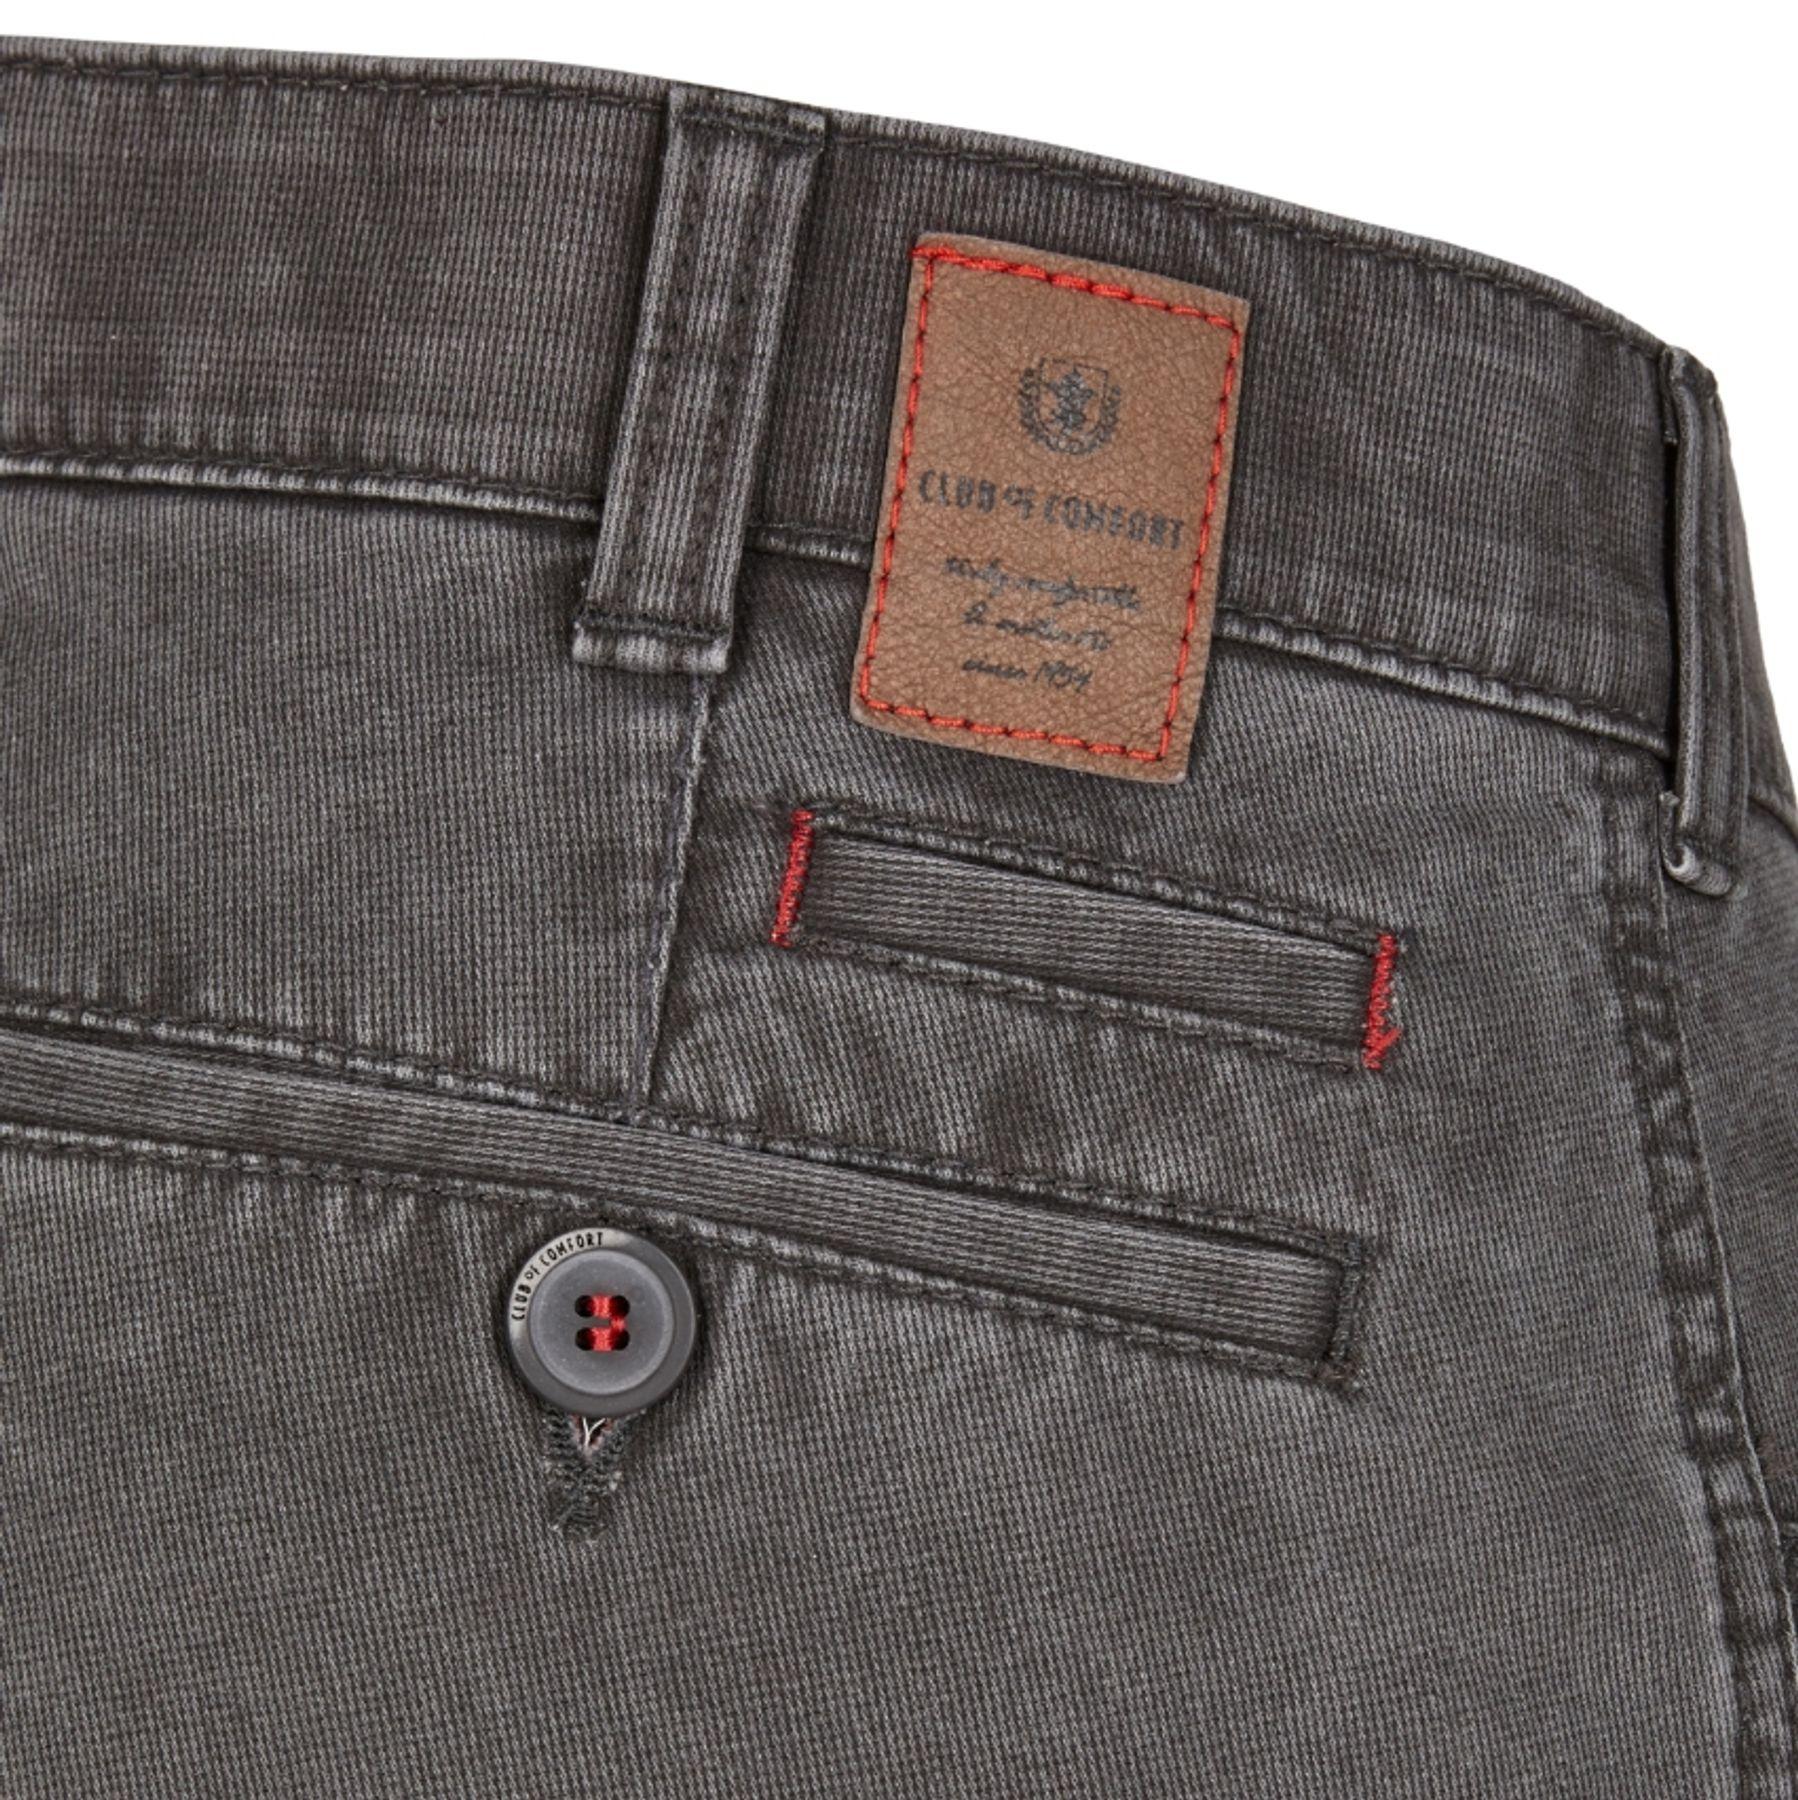 Club of Comfort - Herren Swing-Pocket Hose, Keno mit Thermolite (6429) – Bild 5